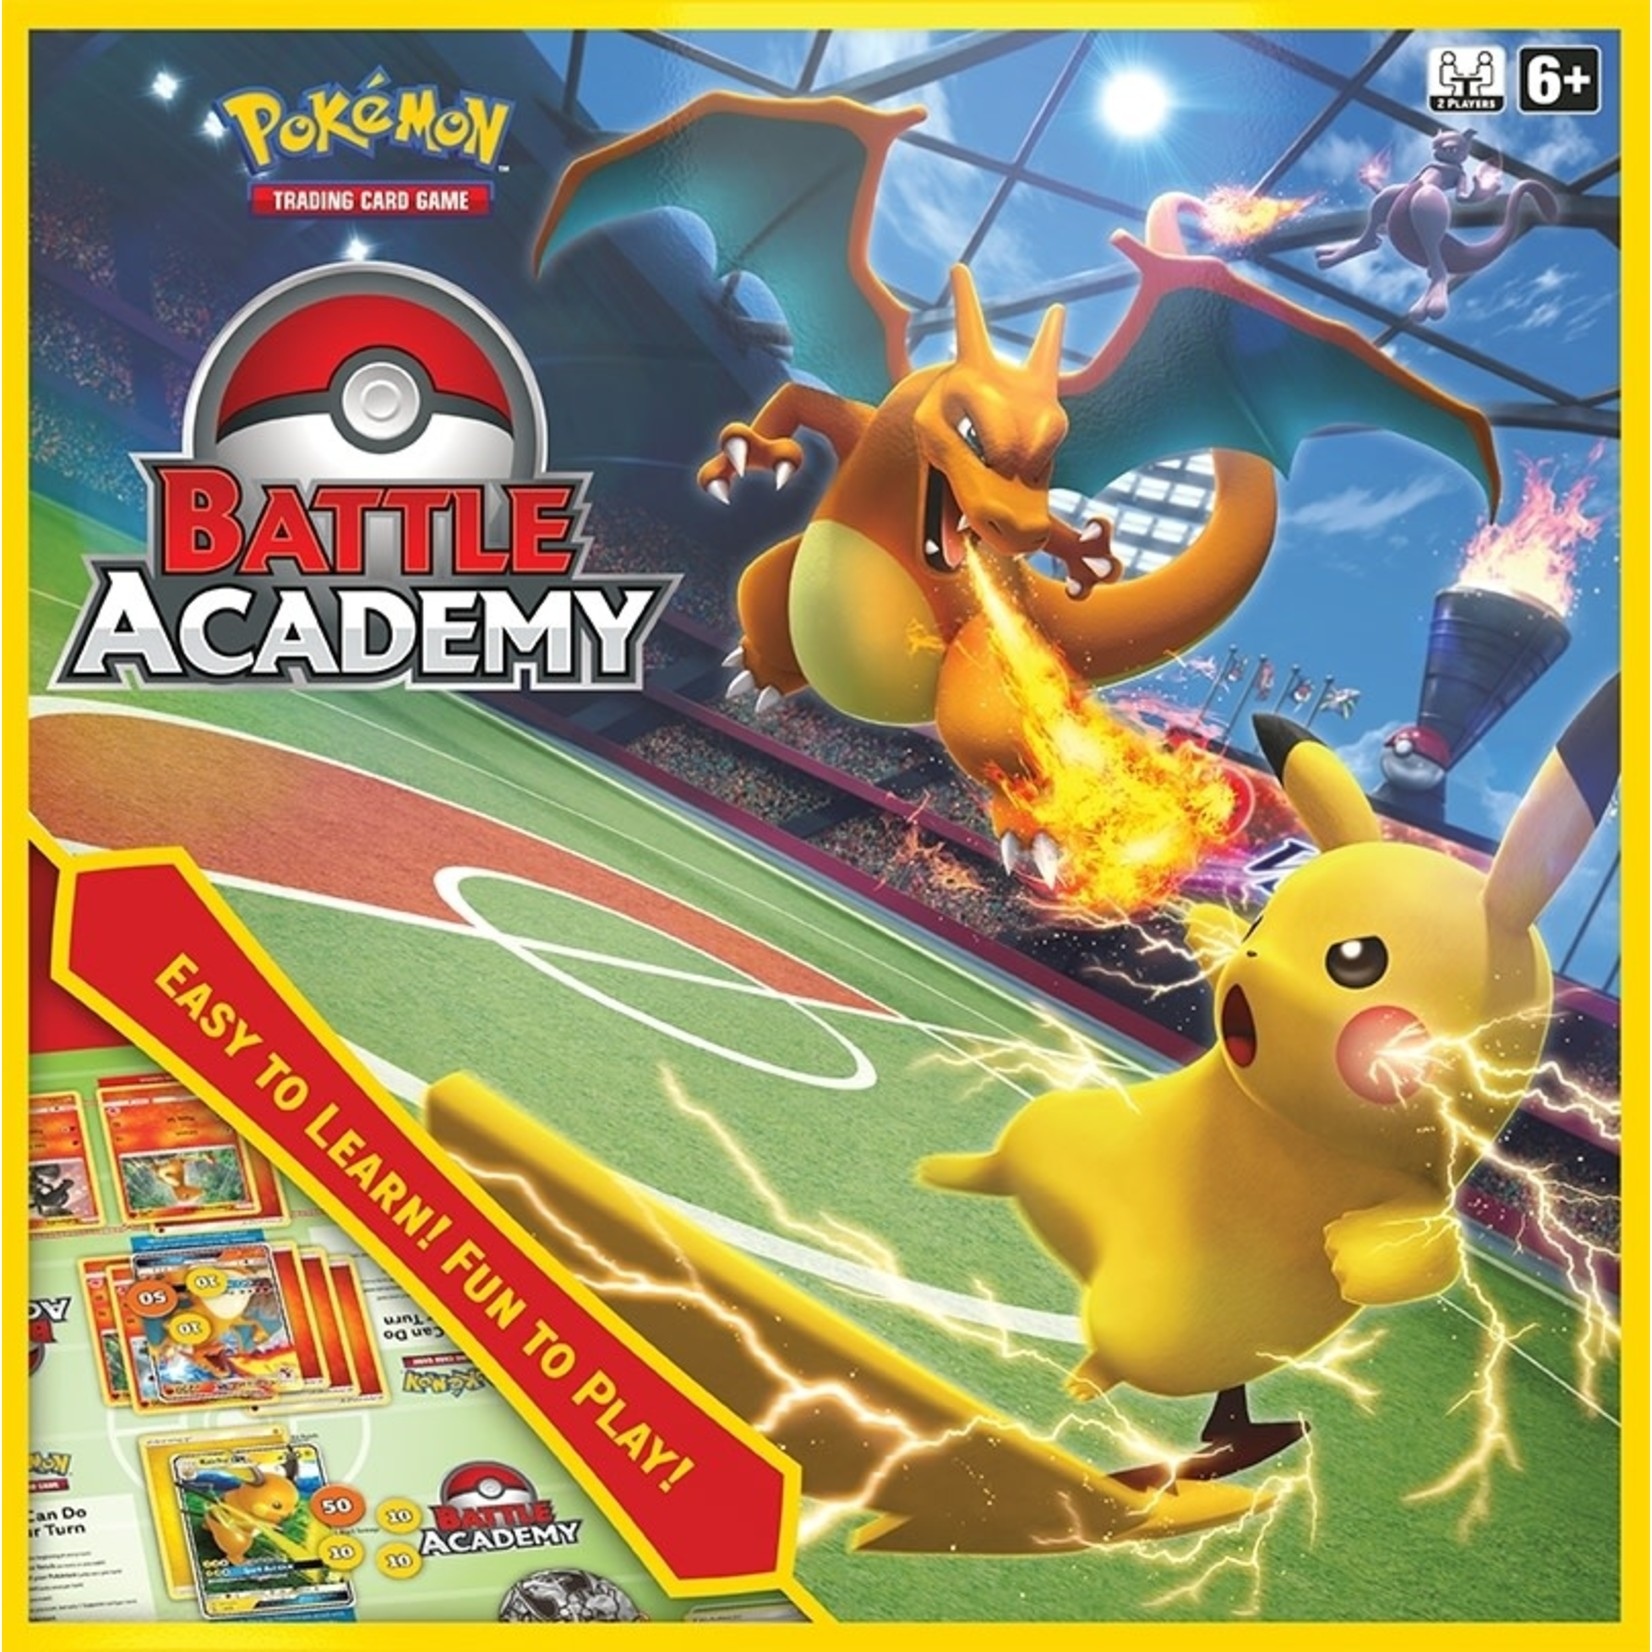 Pokemon International Pokemon TCG: Battle Academy Box